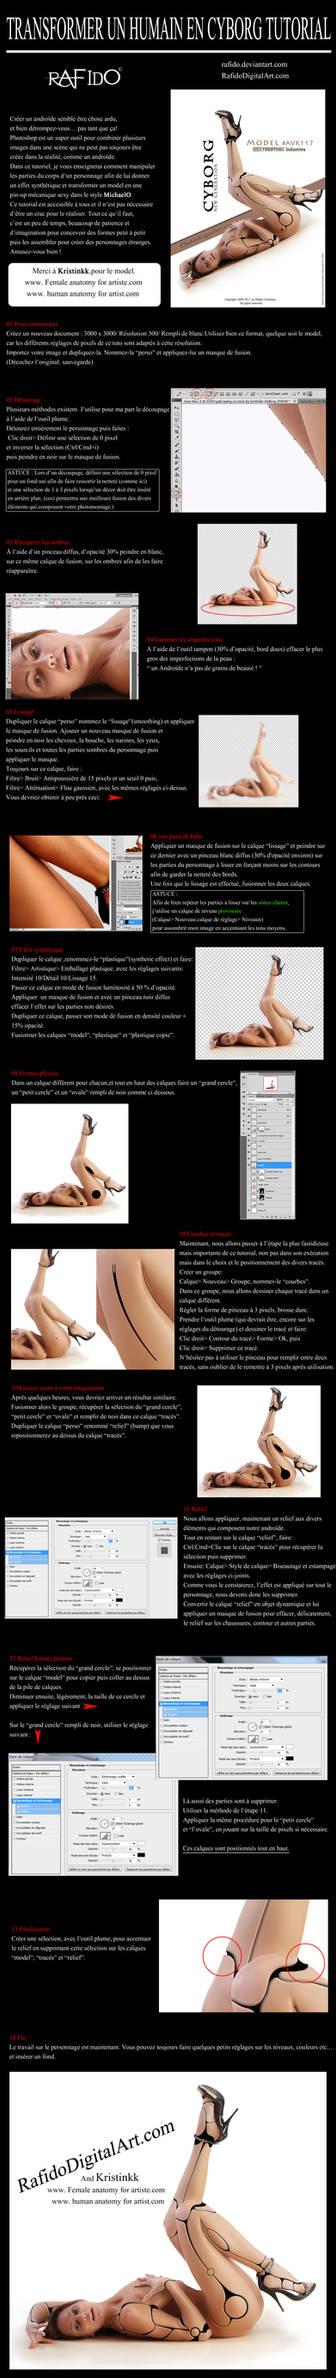 Transformer un humain en cyborg Photoshop tutoriel